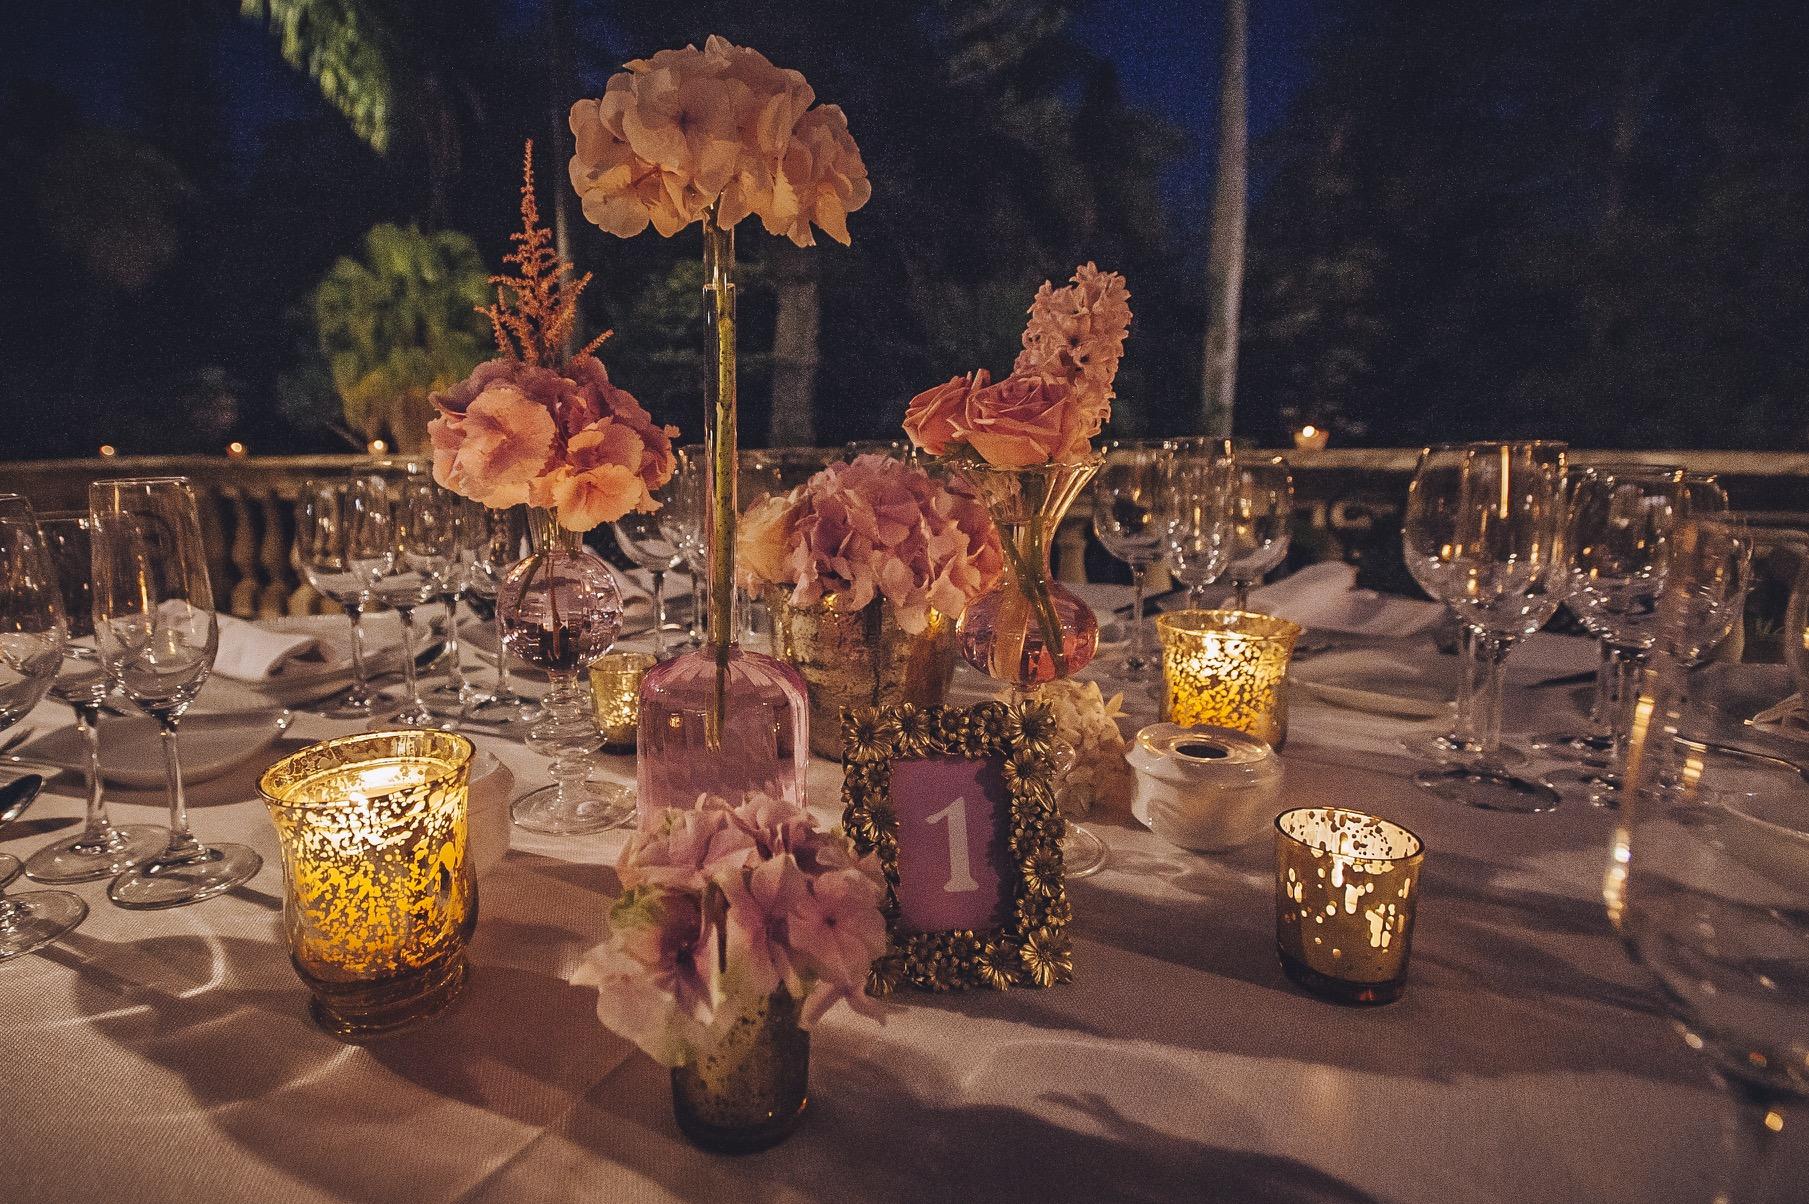 Si-Quiero-Wedding-Planner-By-Sira-Antequera-Virginia-Jose-8